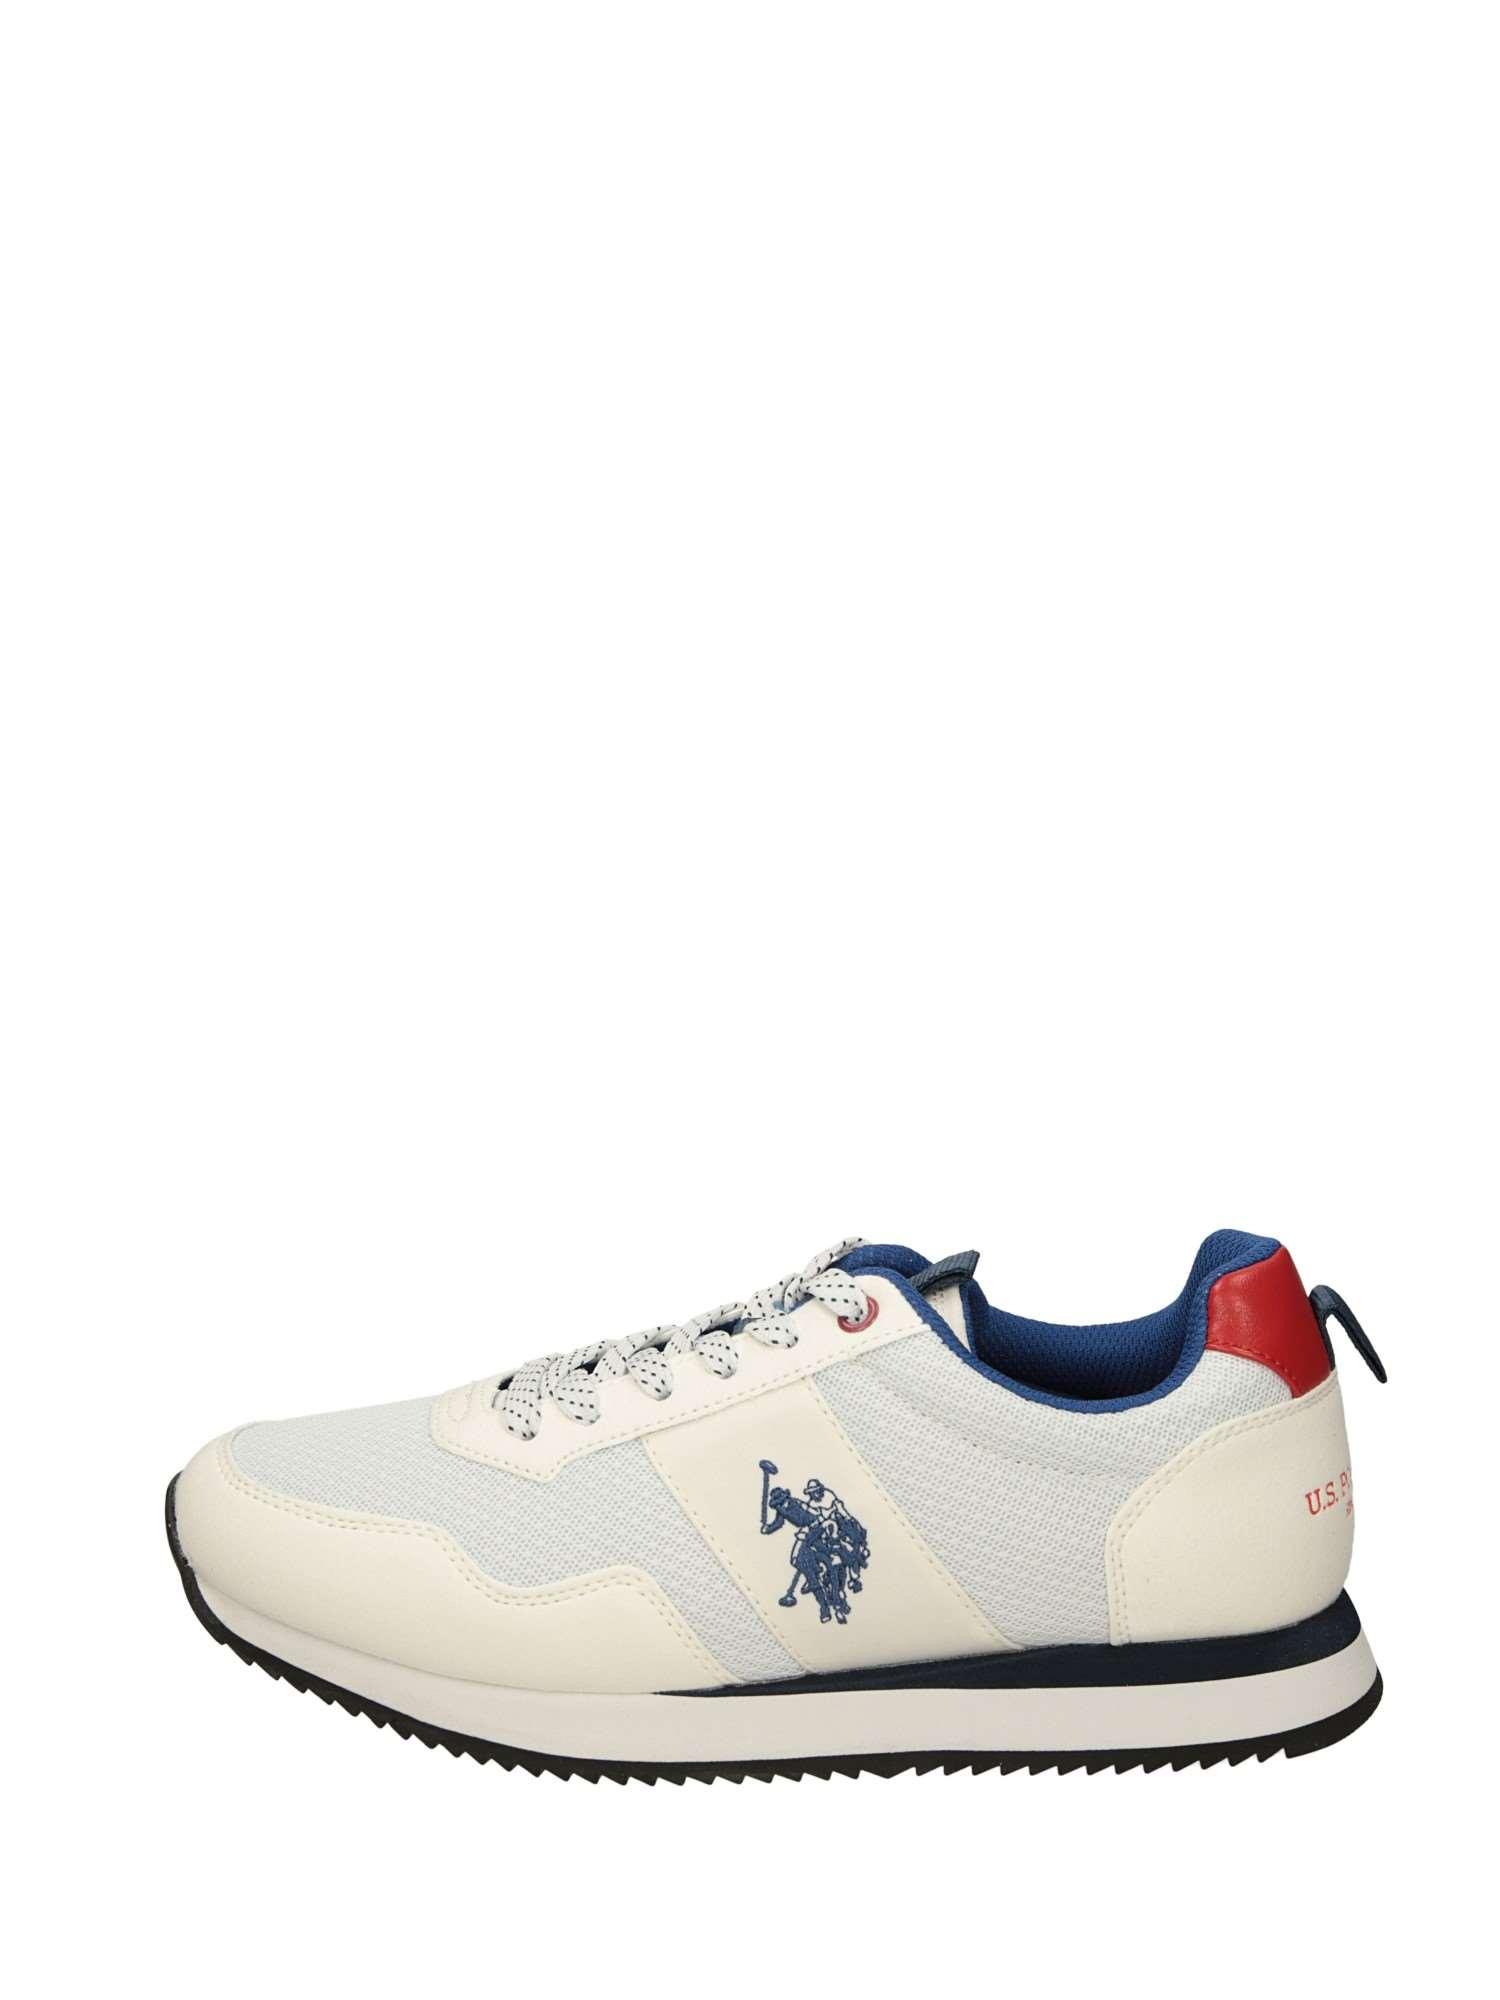 0c33cdb34559e6 U.s. Polo Assn TALBOT3 Bianco Scarpe Uomo Sneakers